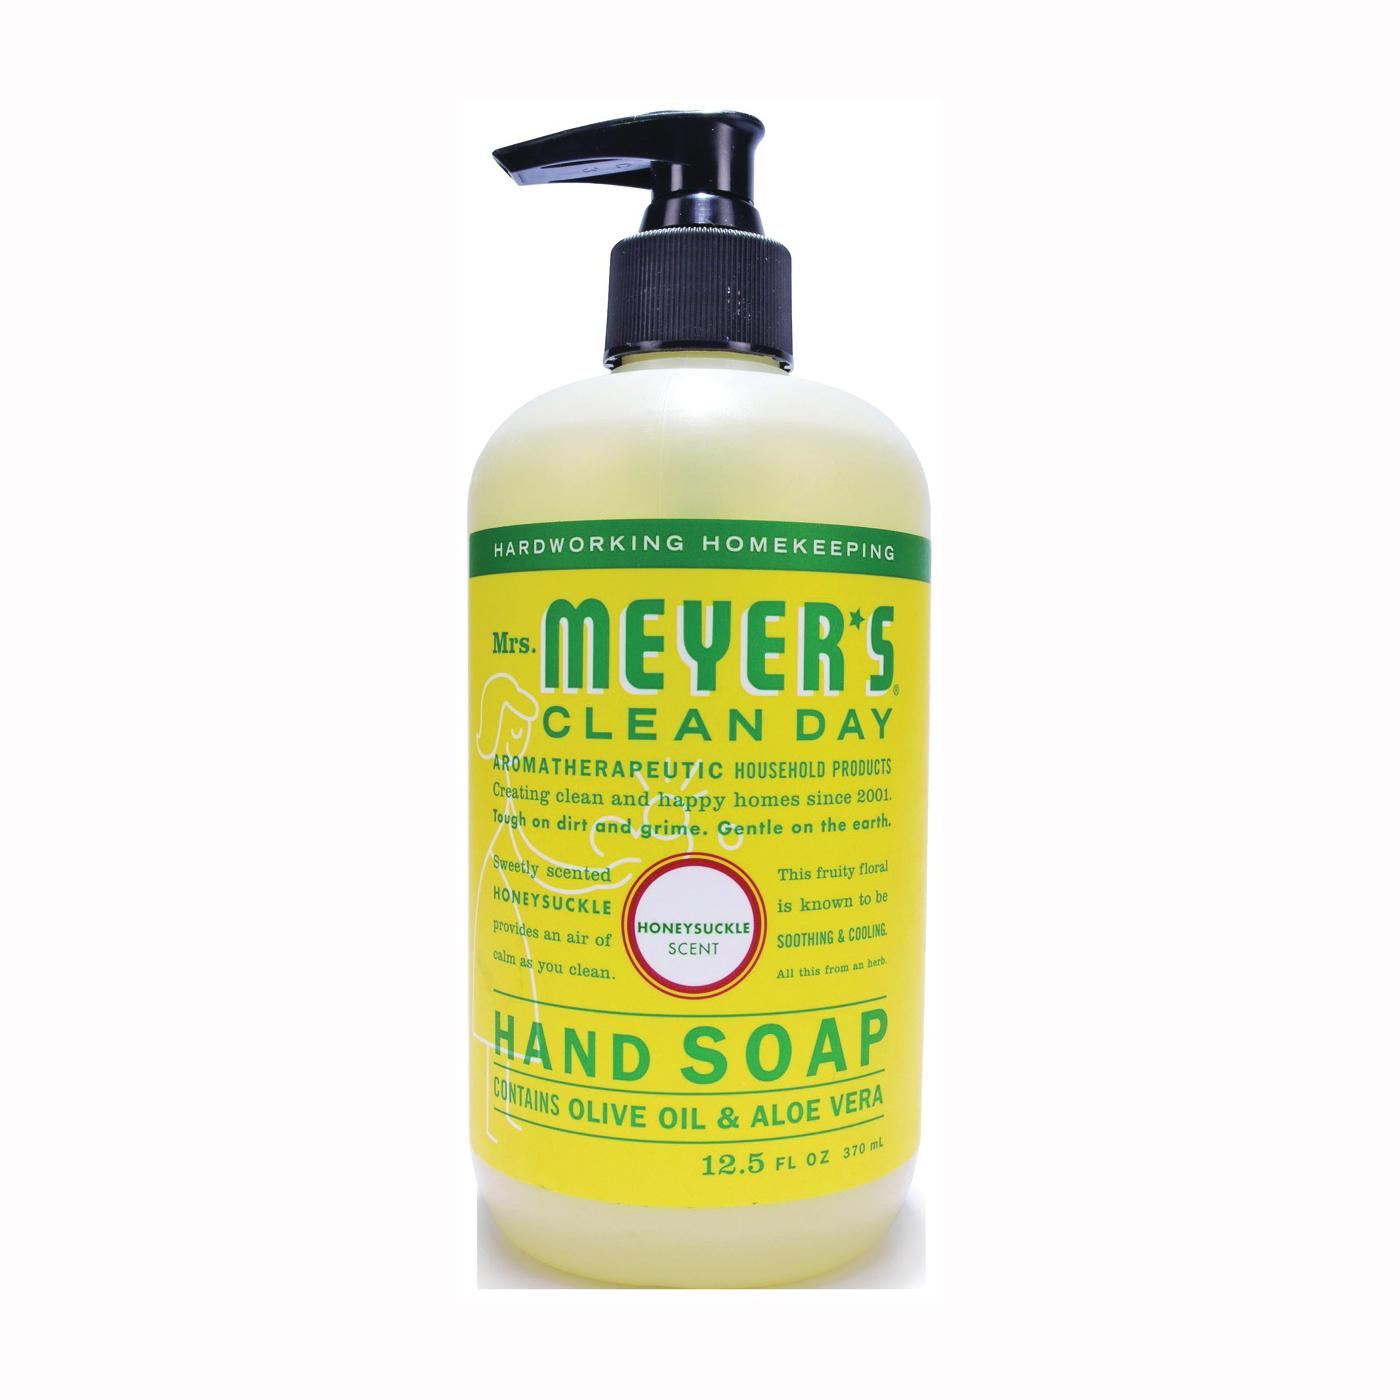 Picture of Mrs. Meyer's 17425 Hand Soap, Liquid, Honeysuckle, 12.5 oz Package, Bottle